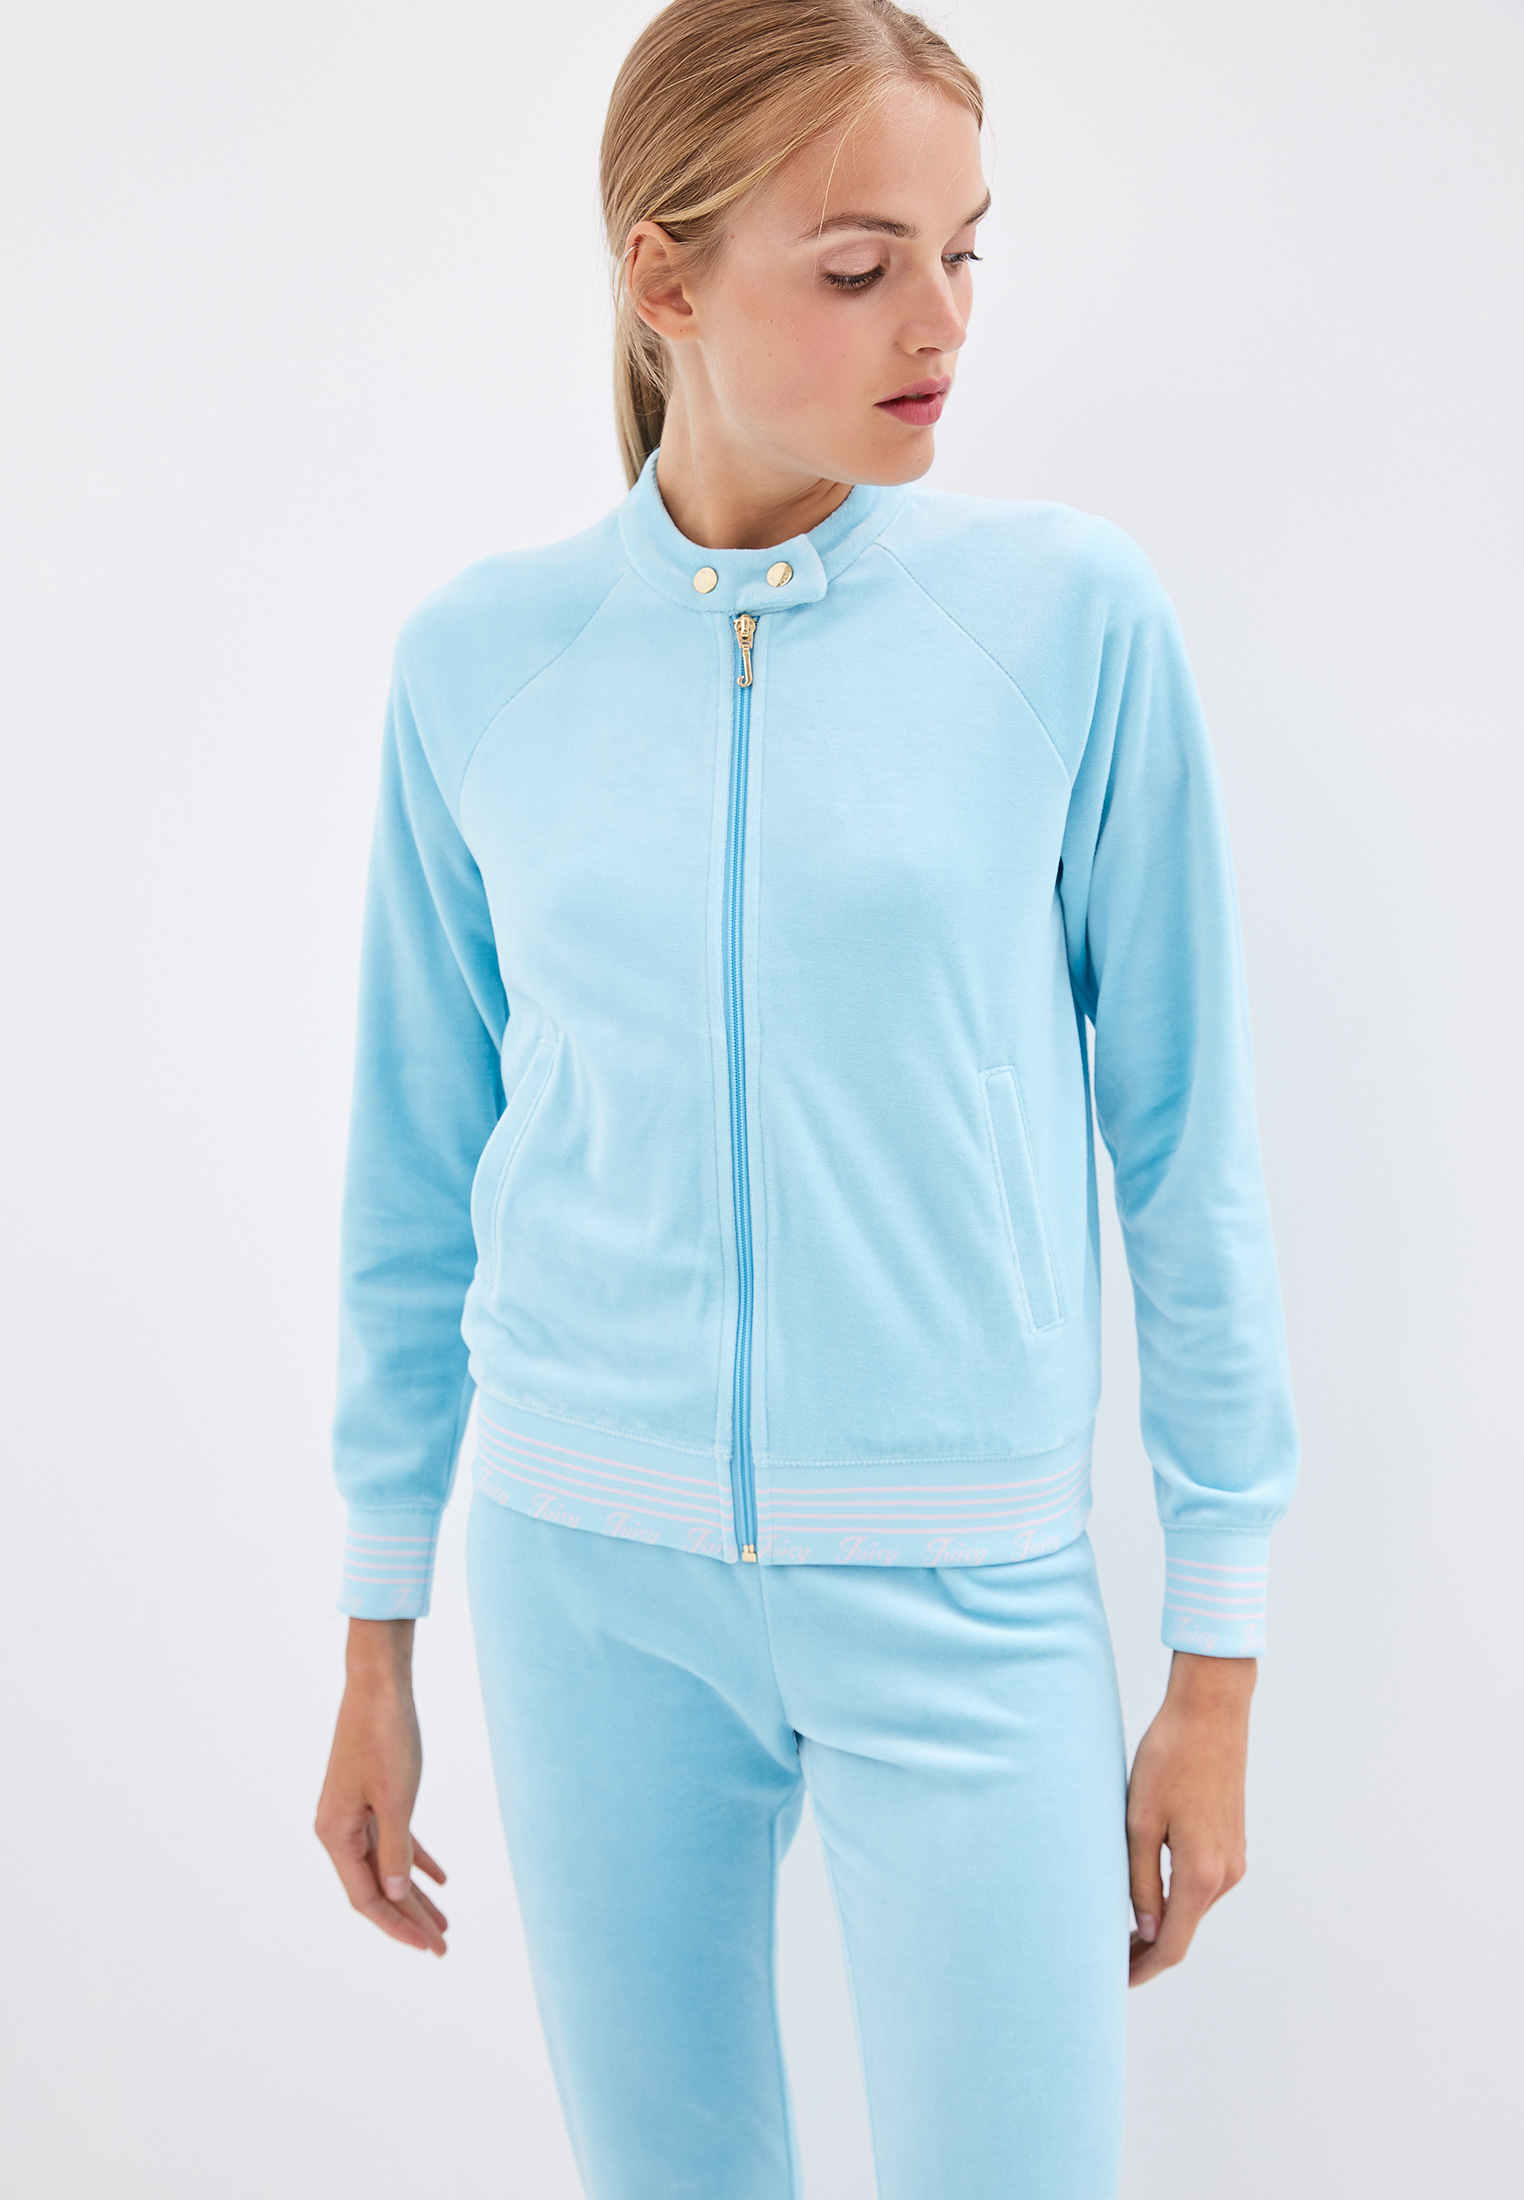 Олимпийка Juicy Couture (Джуси Кутюр) WTKJ212719